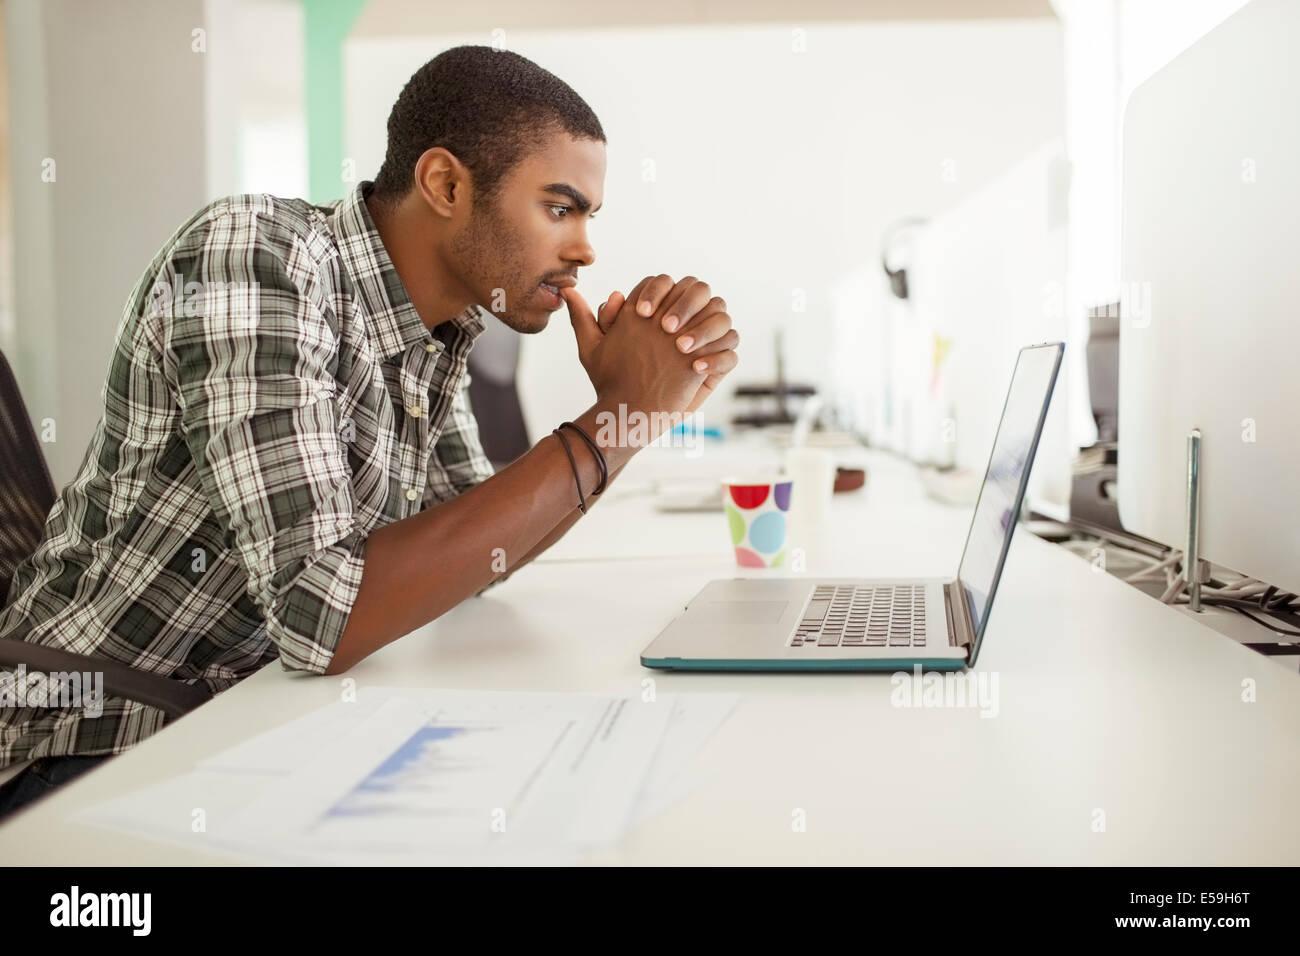 Mann arbeitet am Laptop im Büro Stockbild